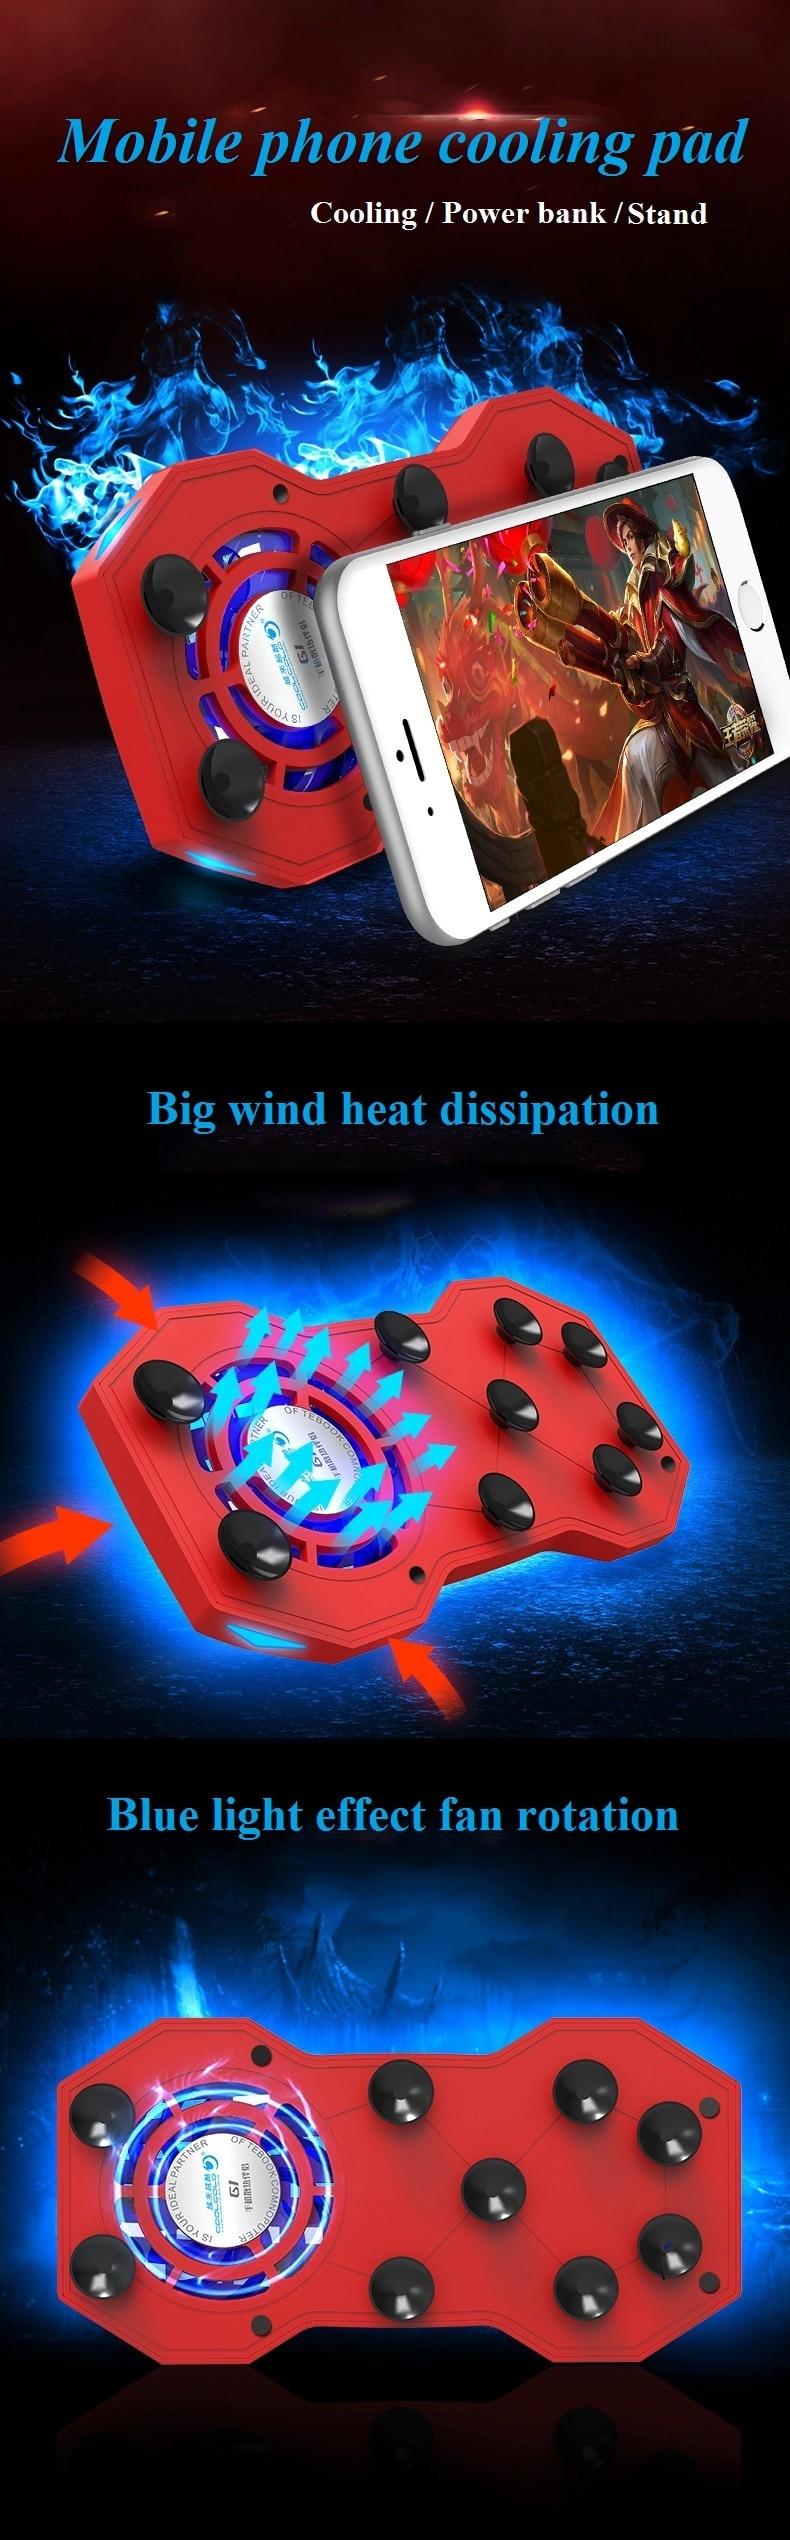 Coolcold G1 Handy Cooling Pad Mute Gaming Kühler Kühler Fans Mit Ring Halter Stand Tragbare Aufladbare Power Bank Laptop Kühlkissen Aliexpress